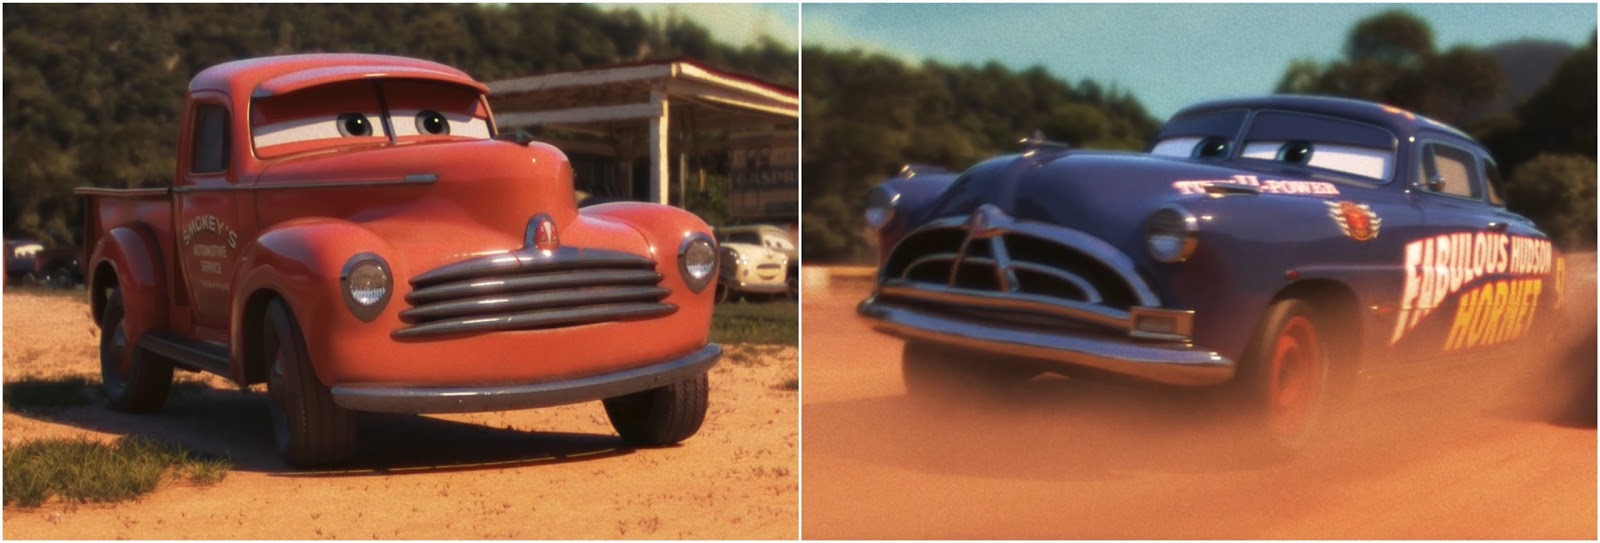 Cars 3: Heyday Smokey & Dirt Track Fabulous Hudson Hornet 2-Pack